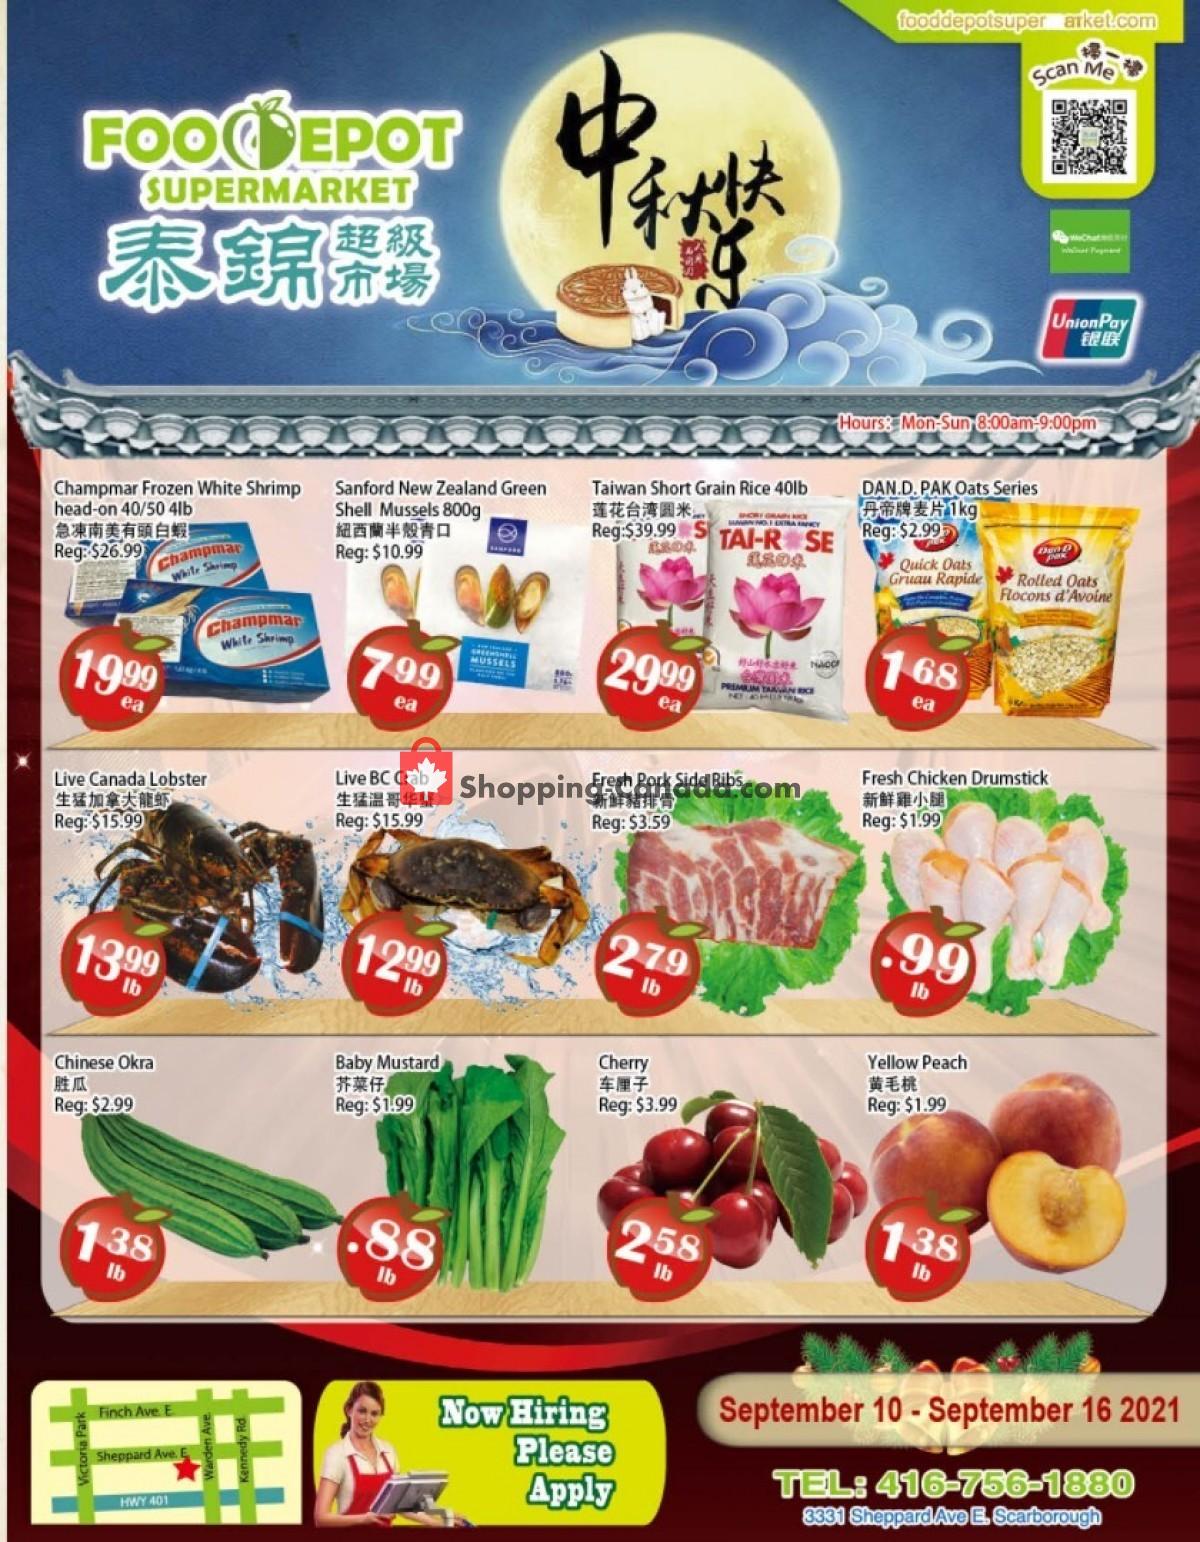 Flyer Food Depot Supermarket Canada - from Friday September 10, 2021 to Thursday September 16, 2021